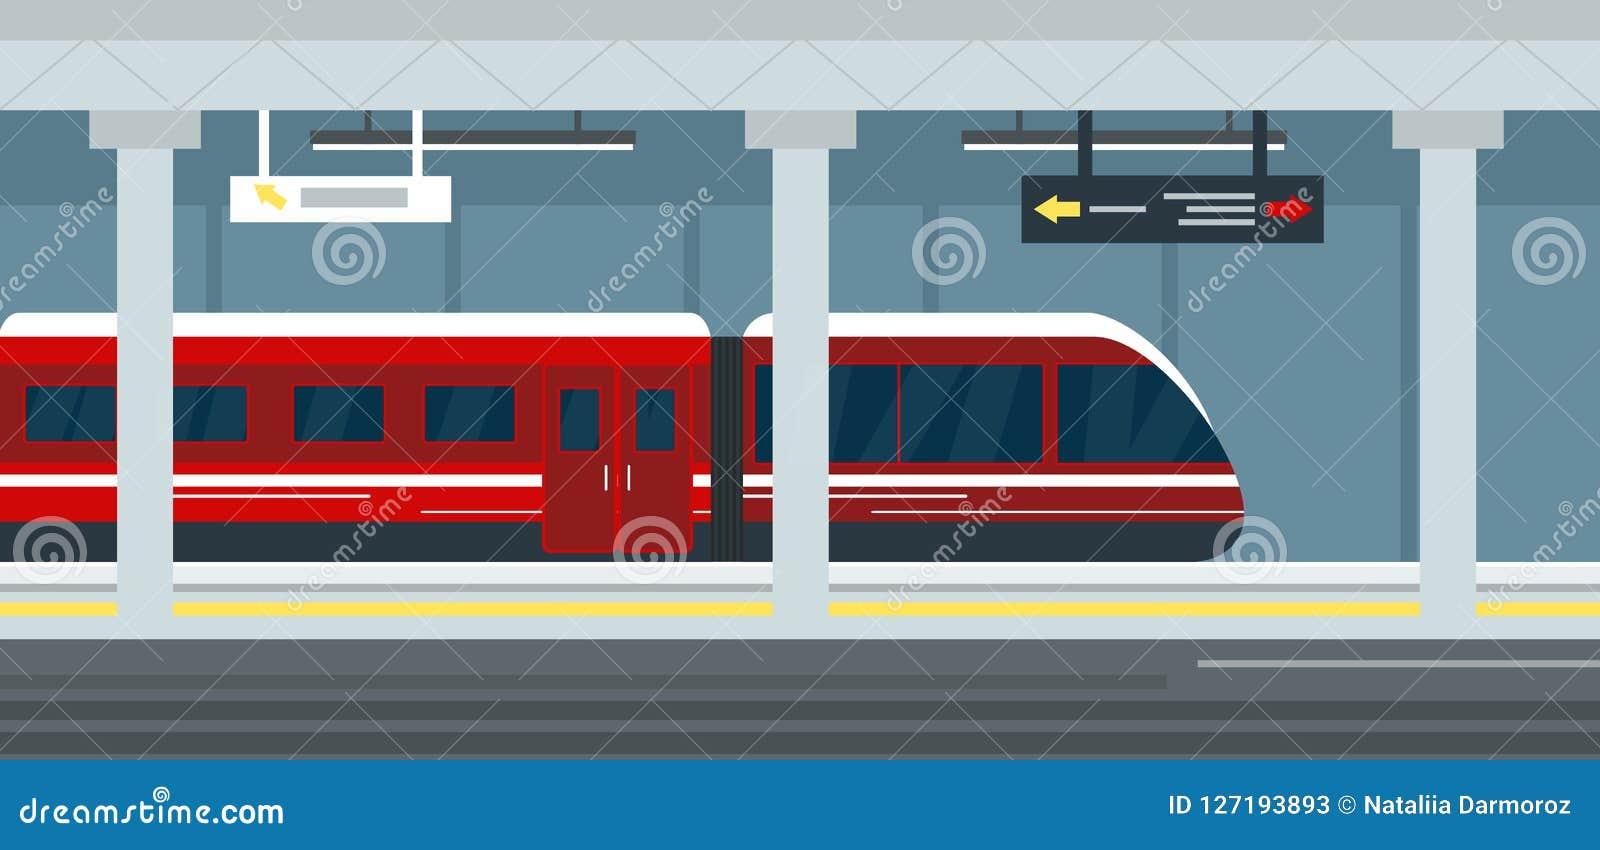 Vector illustration of empty subway station interior, subway railway station underground, metro platform and train